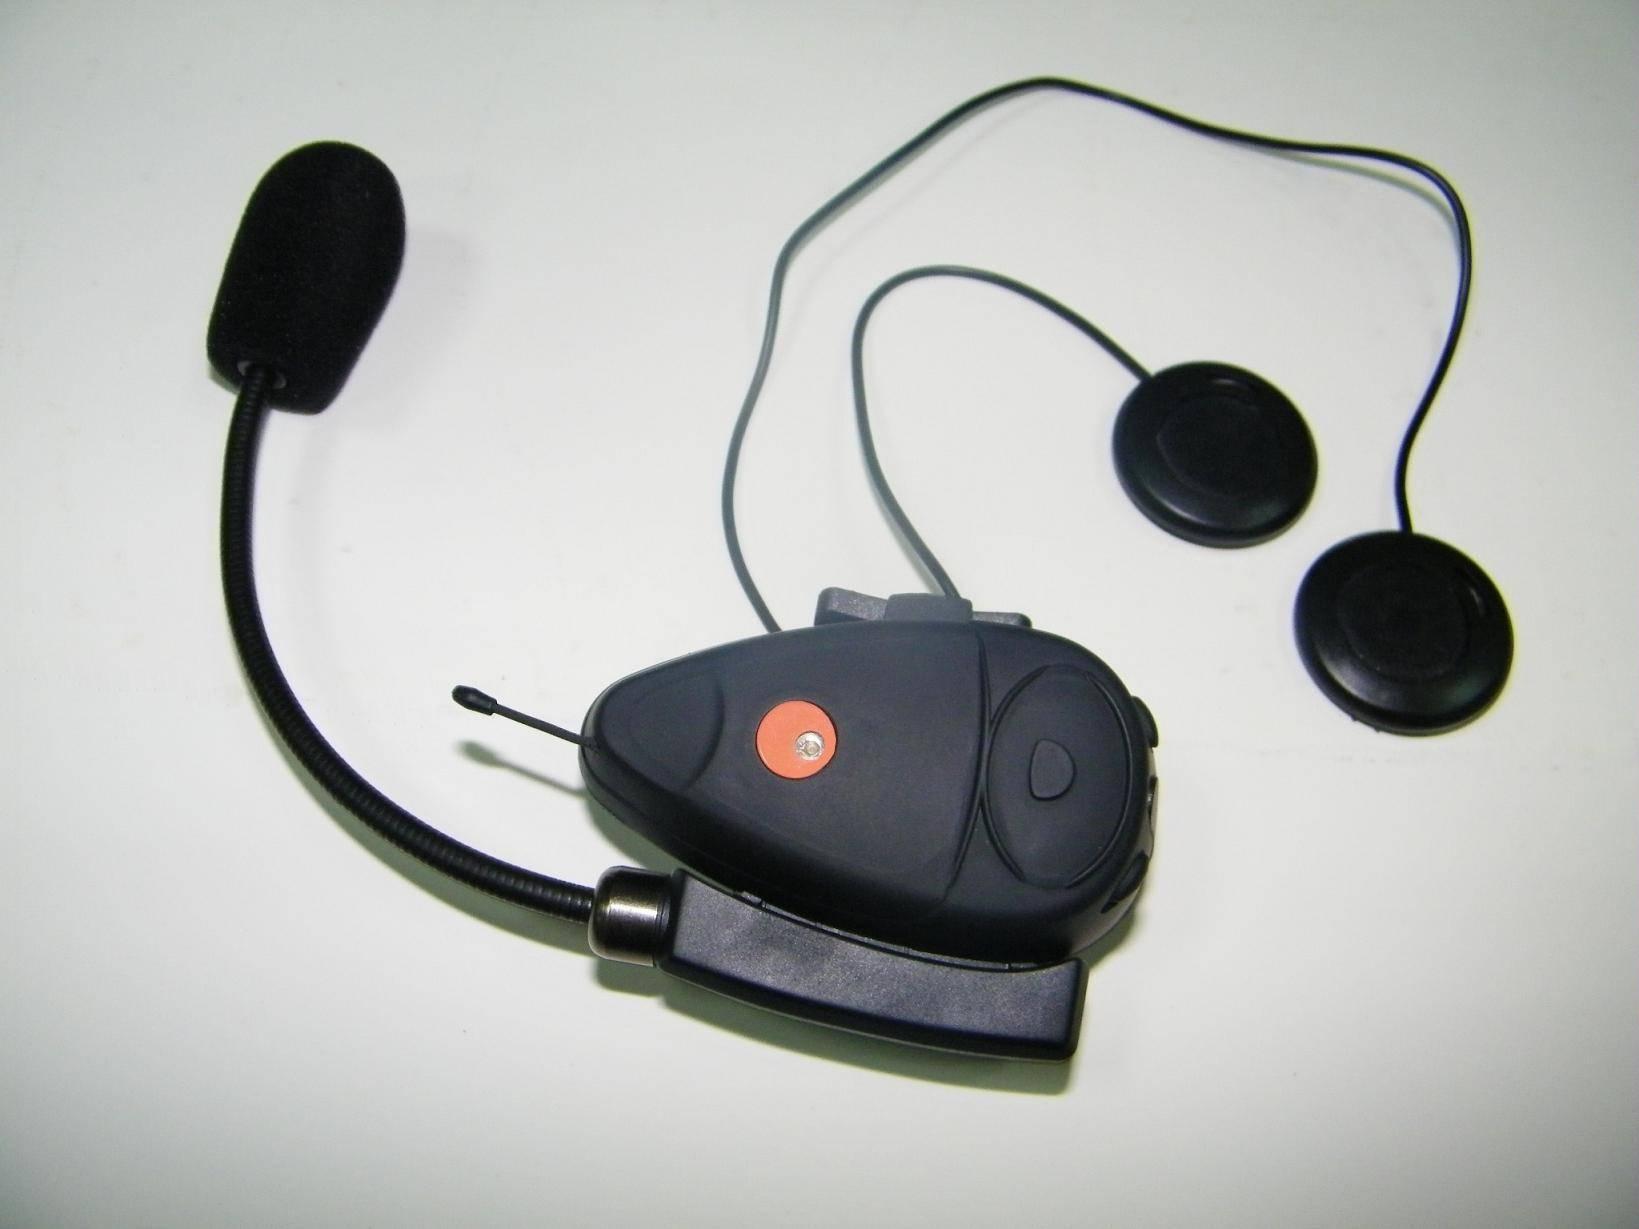 Wireless Bluetooth Intercom Motorcycle Helmet Headset Communicator(Embedded FM Radio) BT-9802